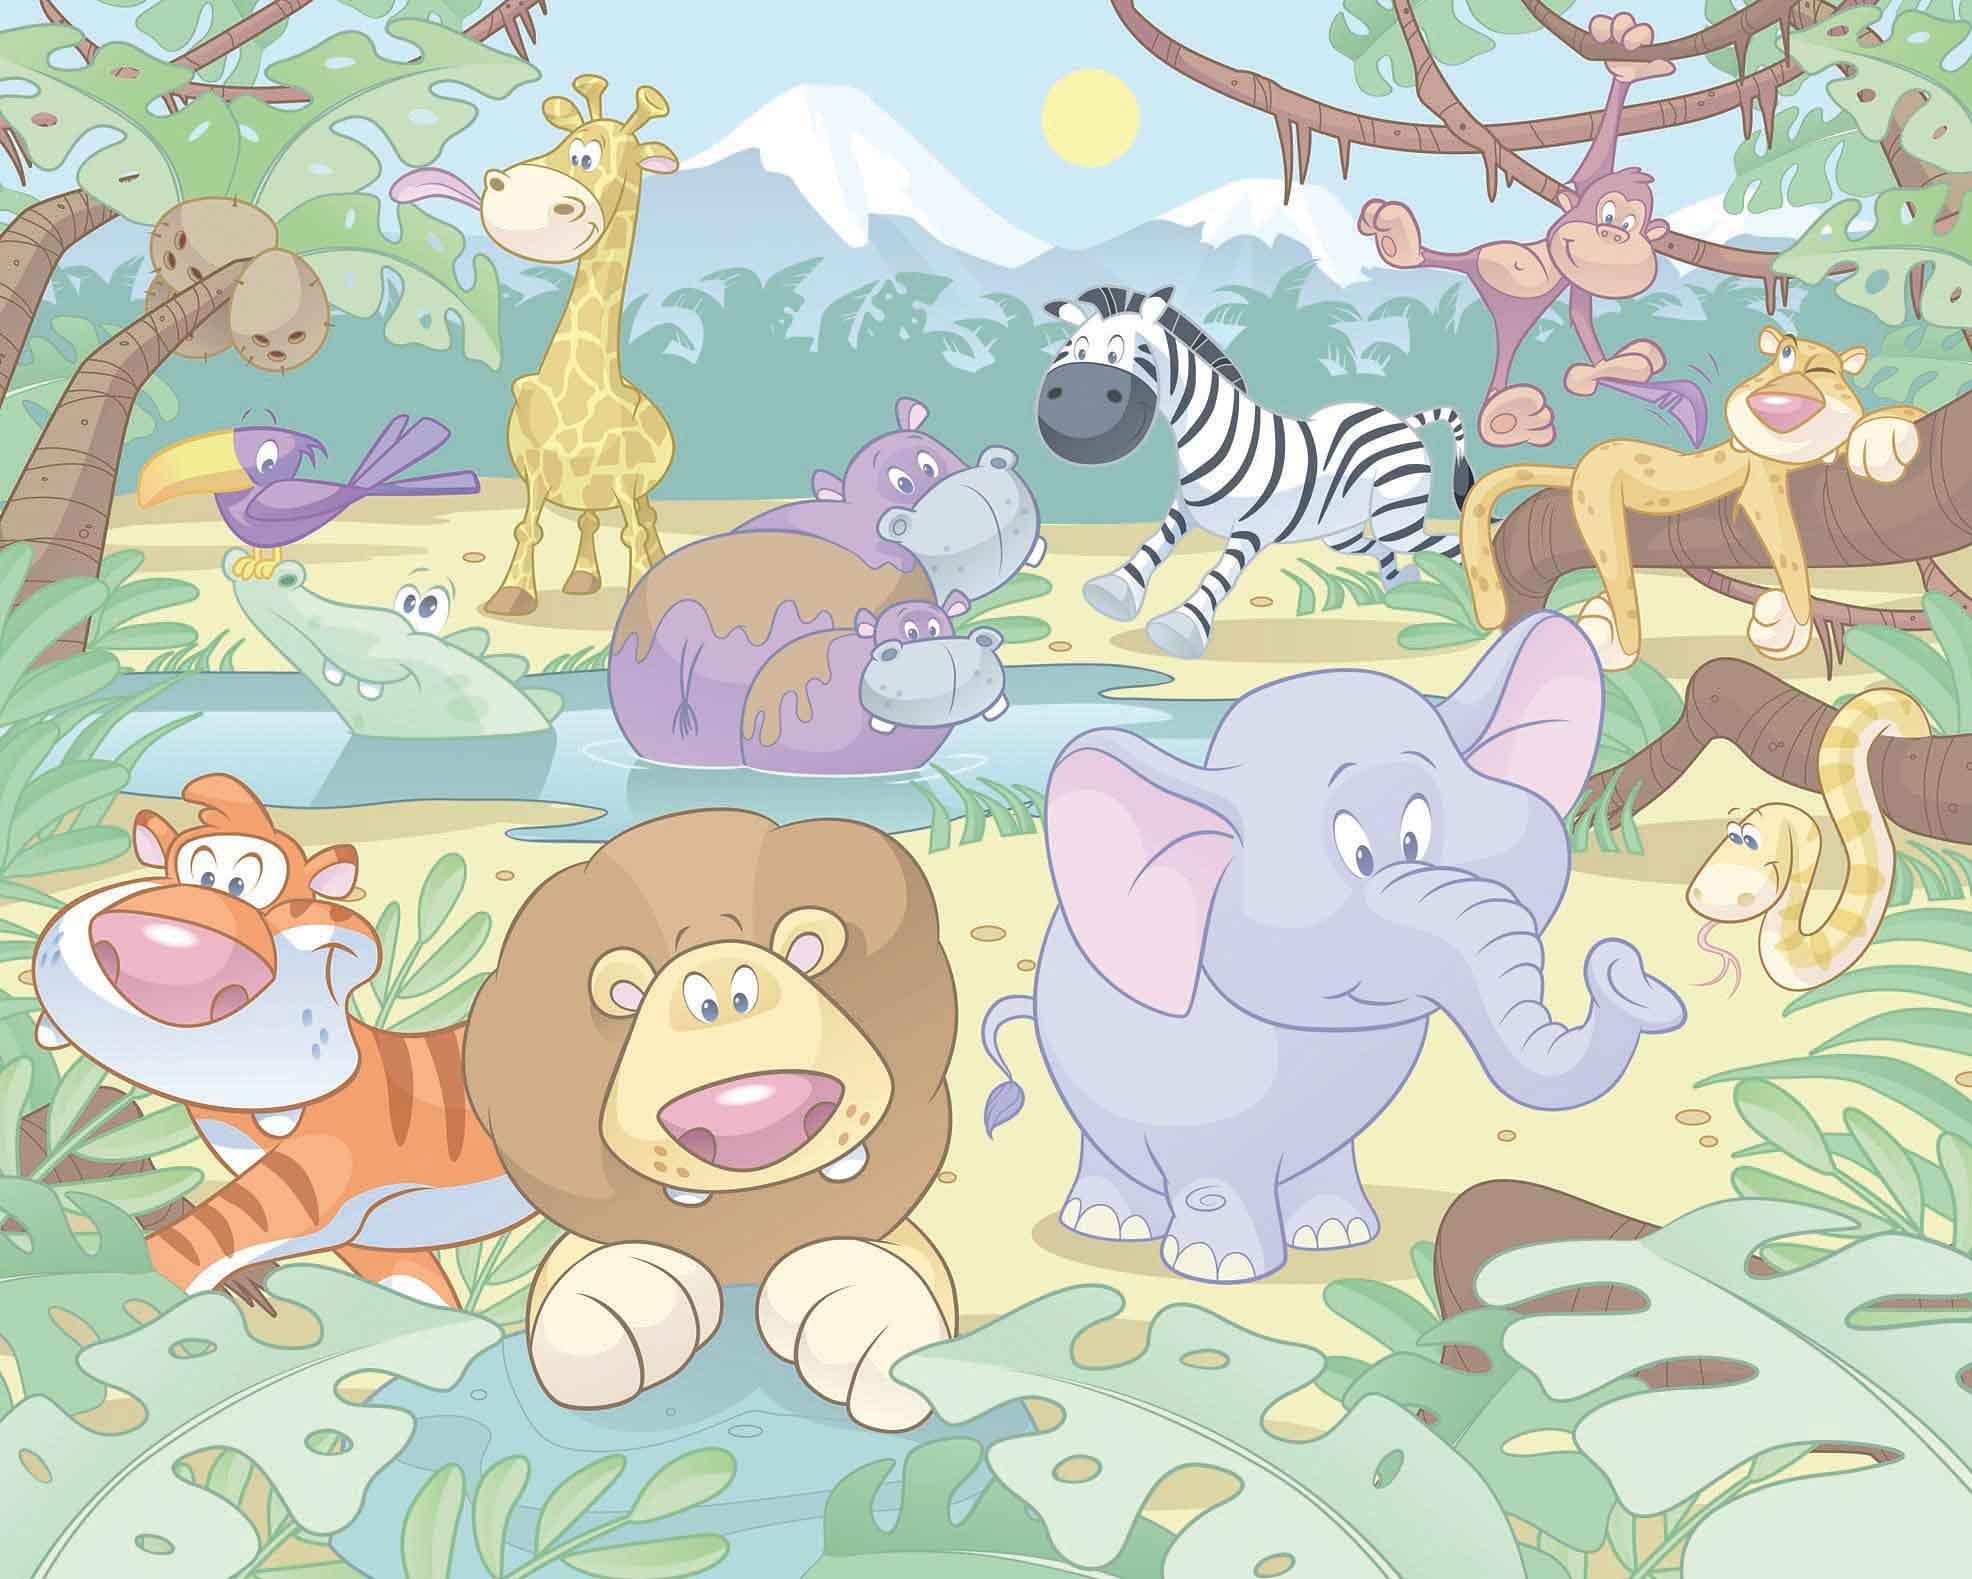 Fototapete Kinderzimmer Baby Dschungel Safari-Walltastic Fototapete